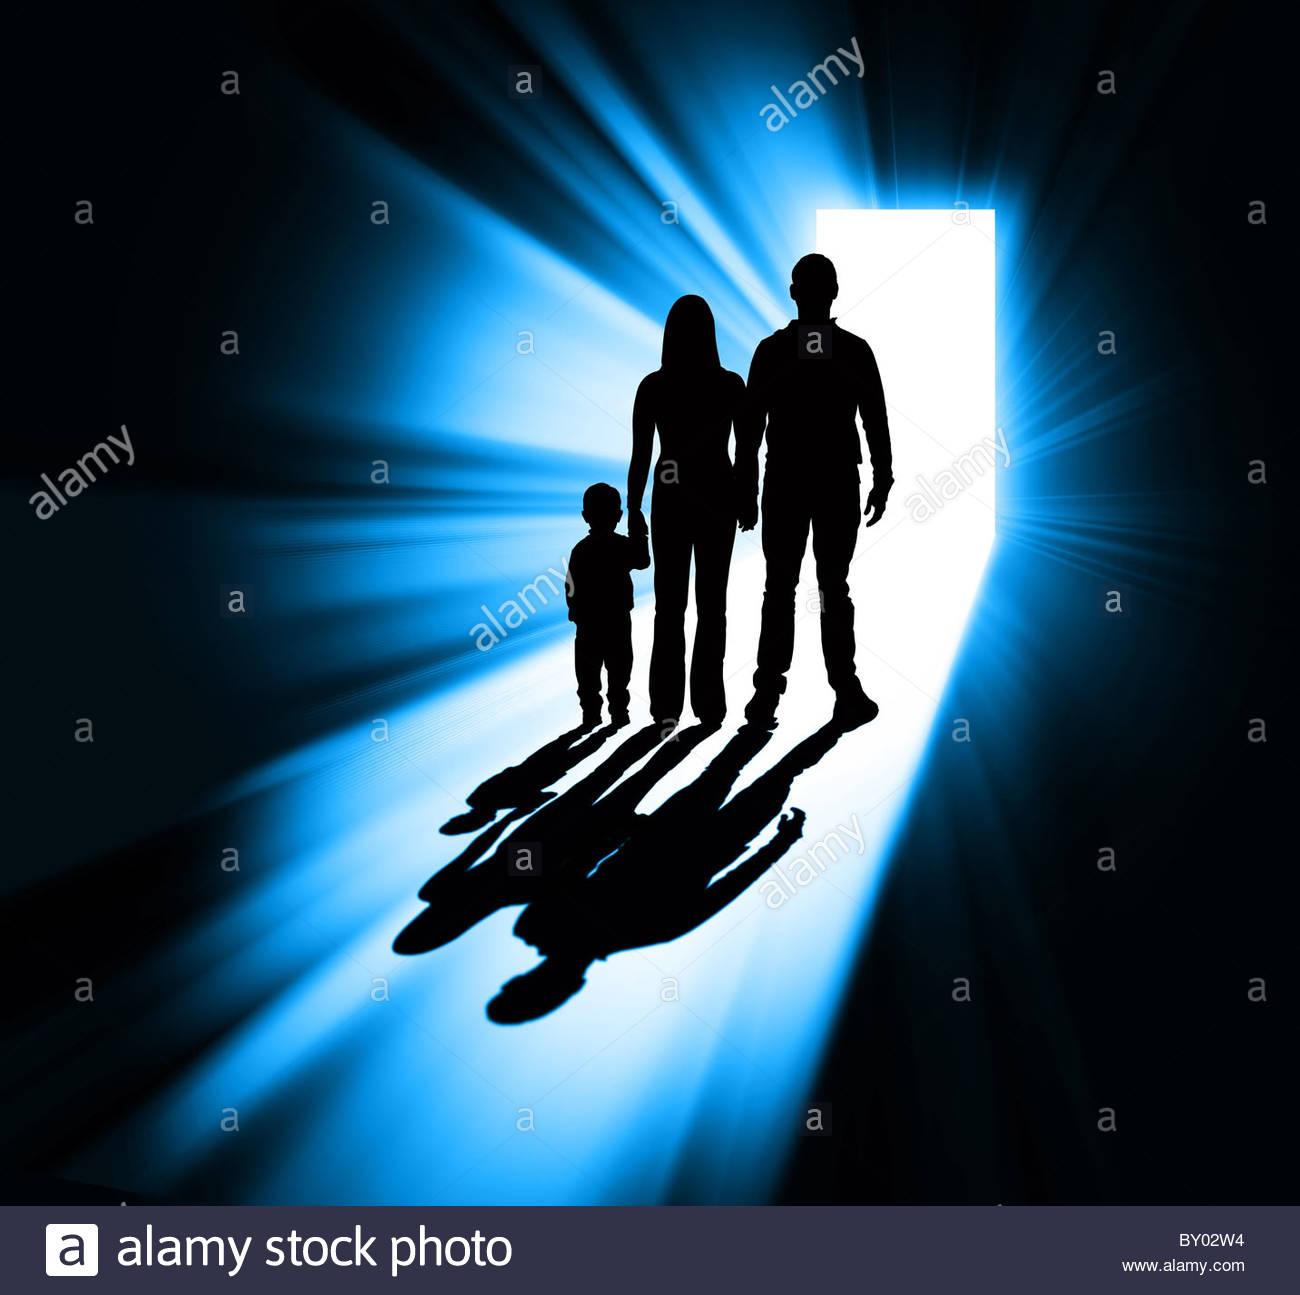 Familia silueta en portada Imagen De Stock